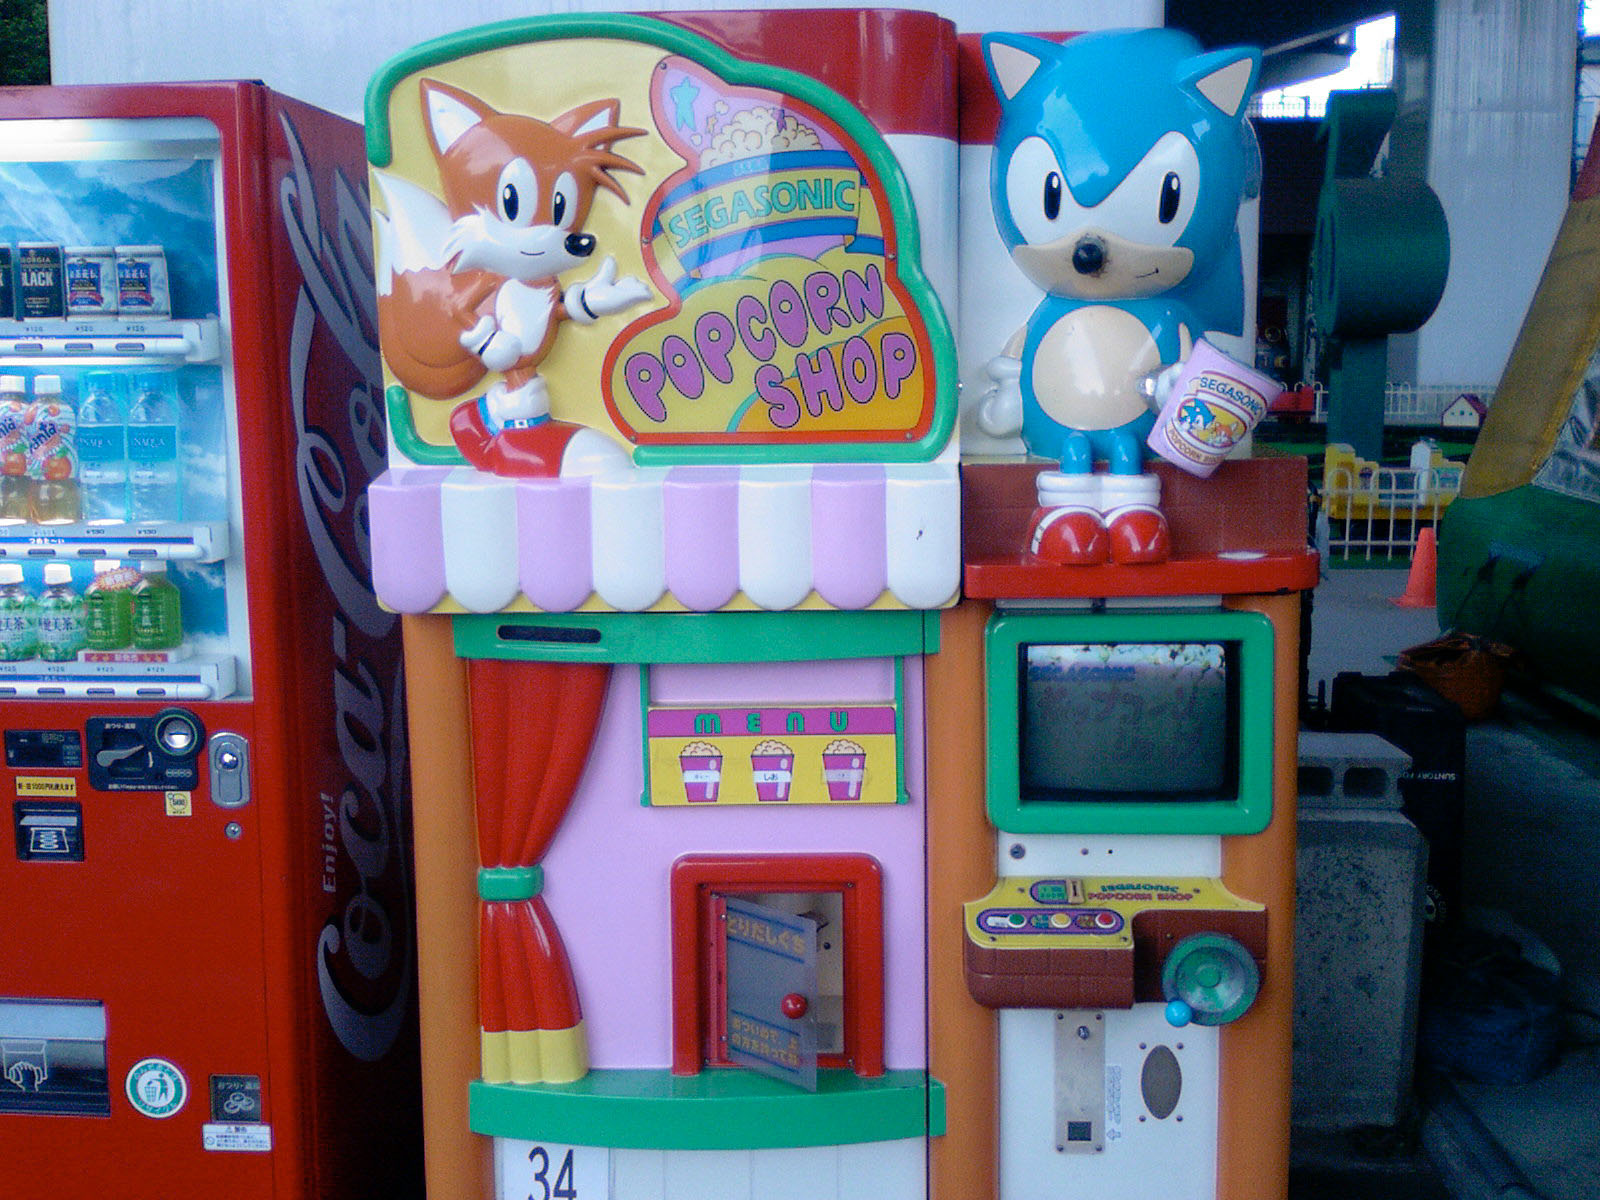 machine that makes sonic